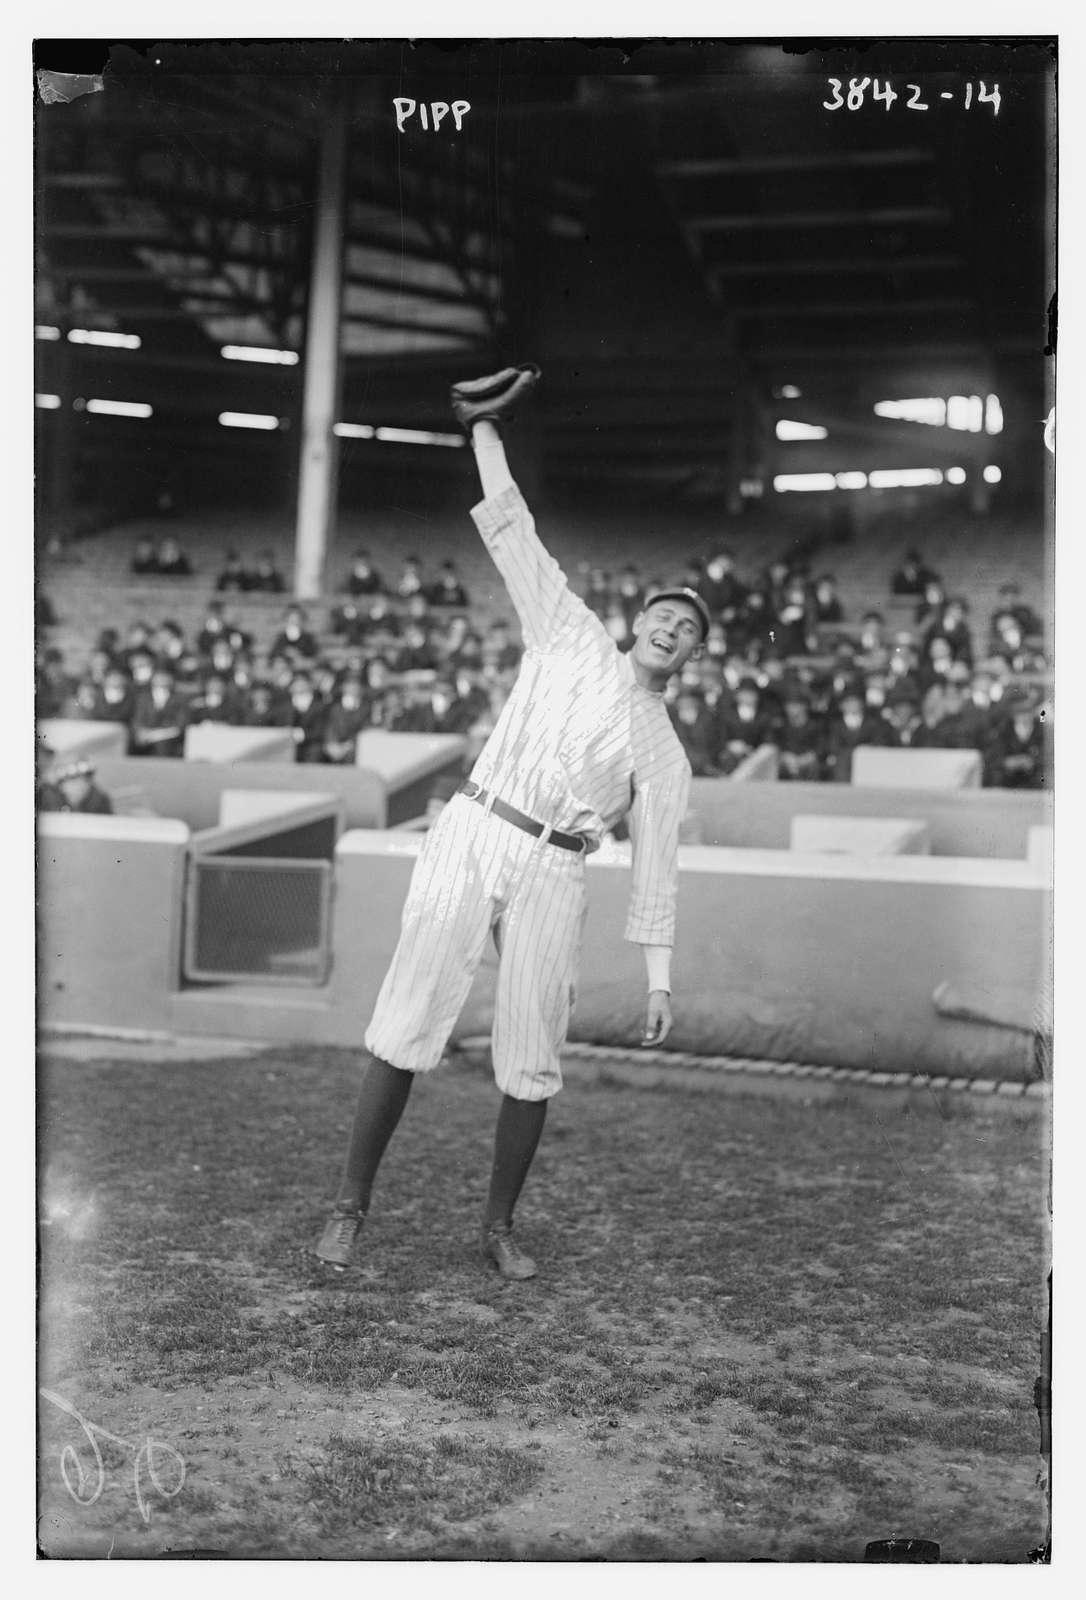 Wally Pipp, New York AL (baseball)